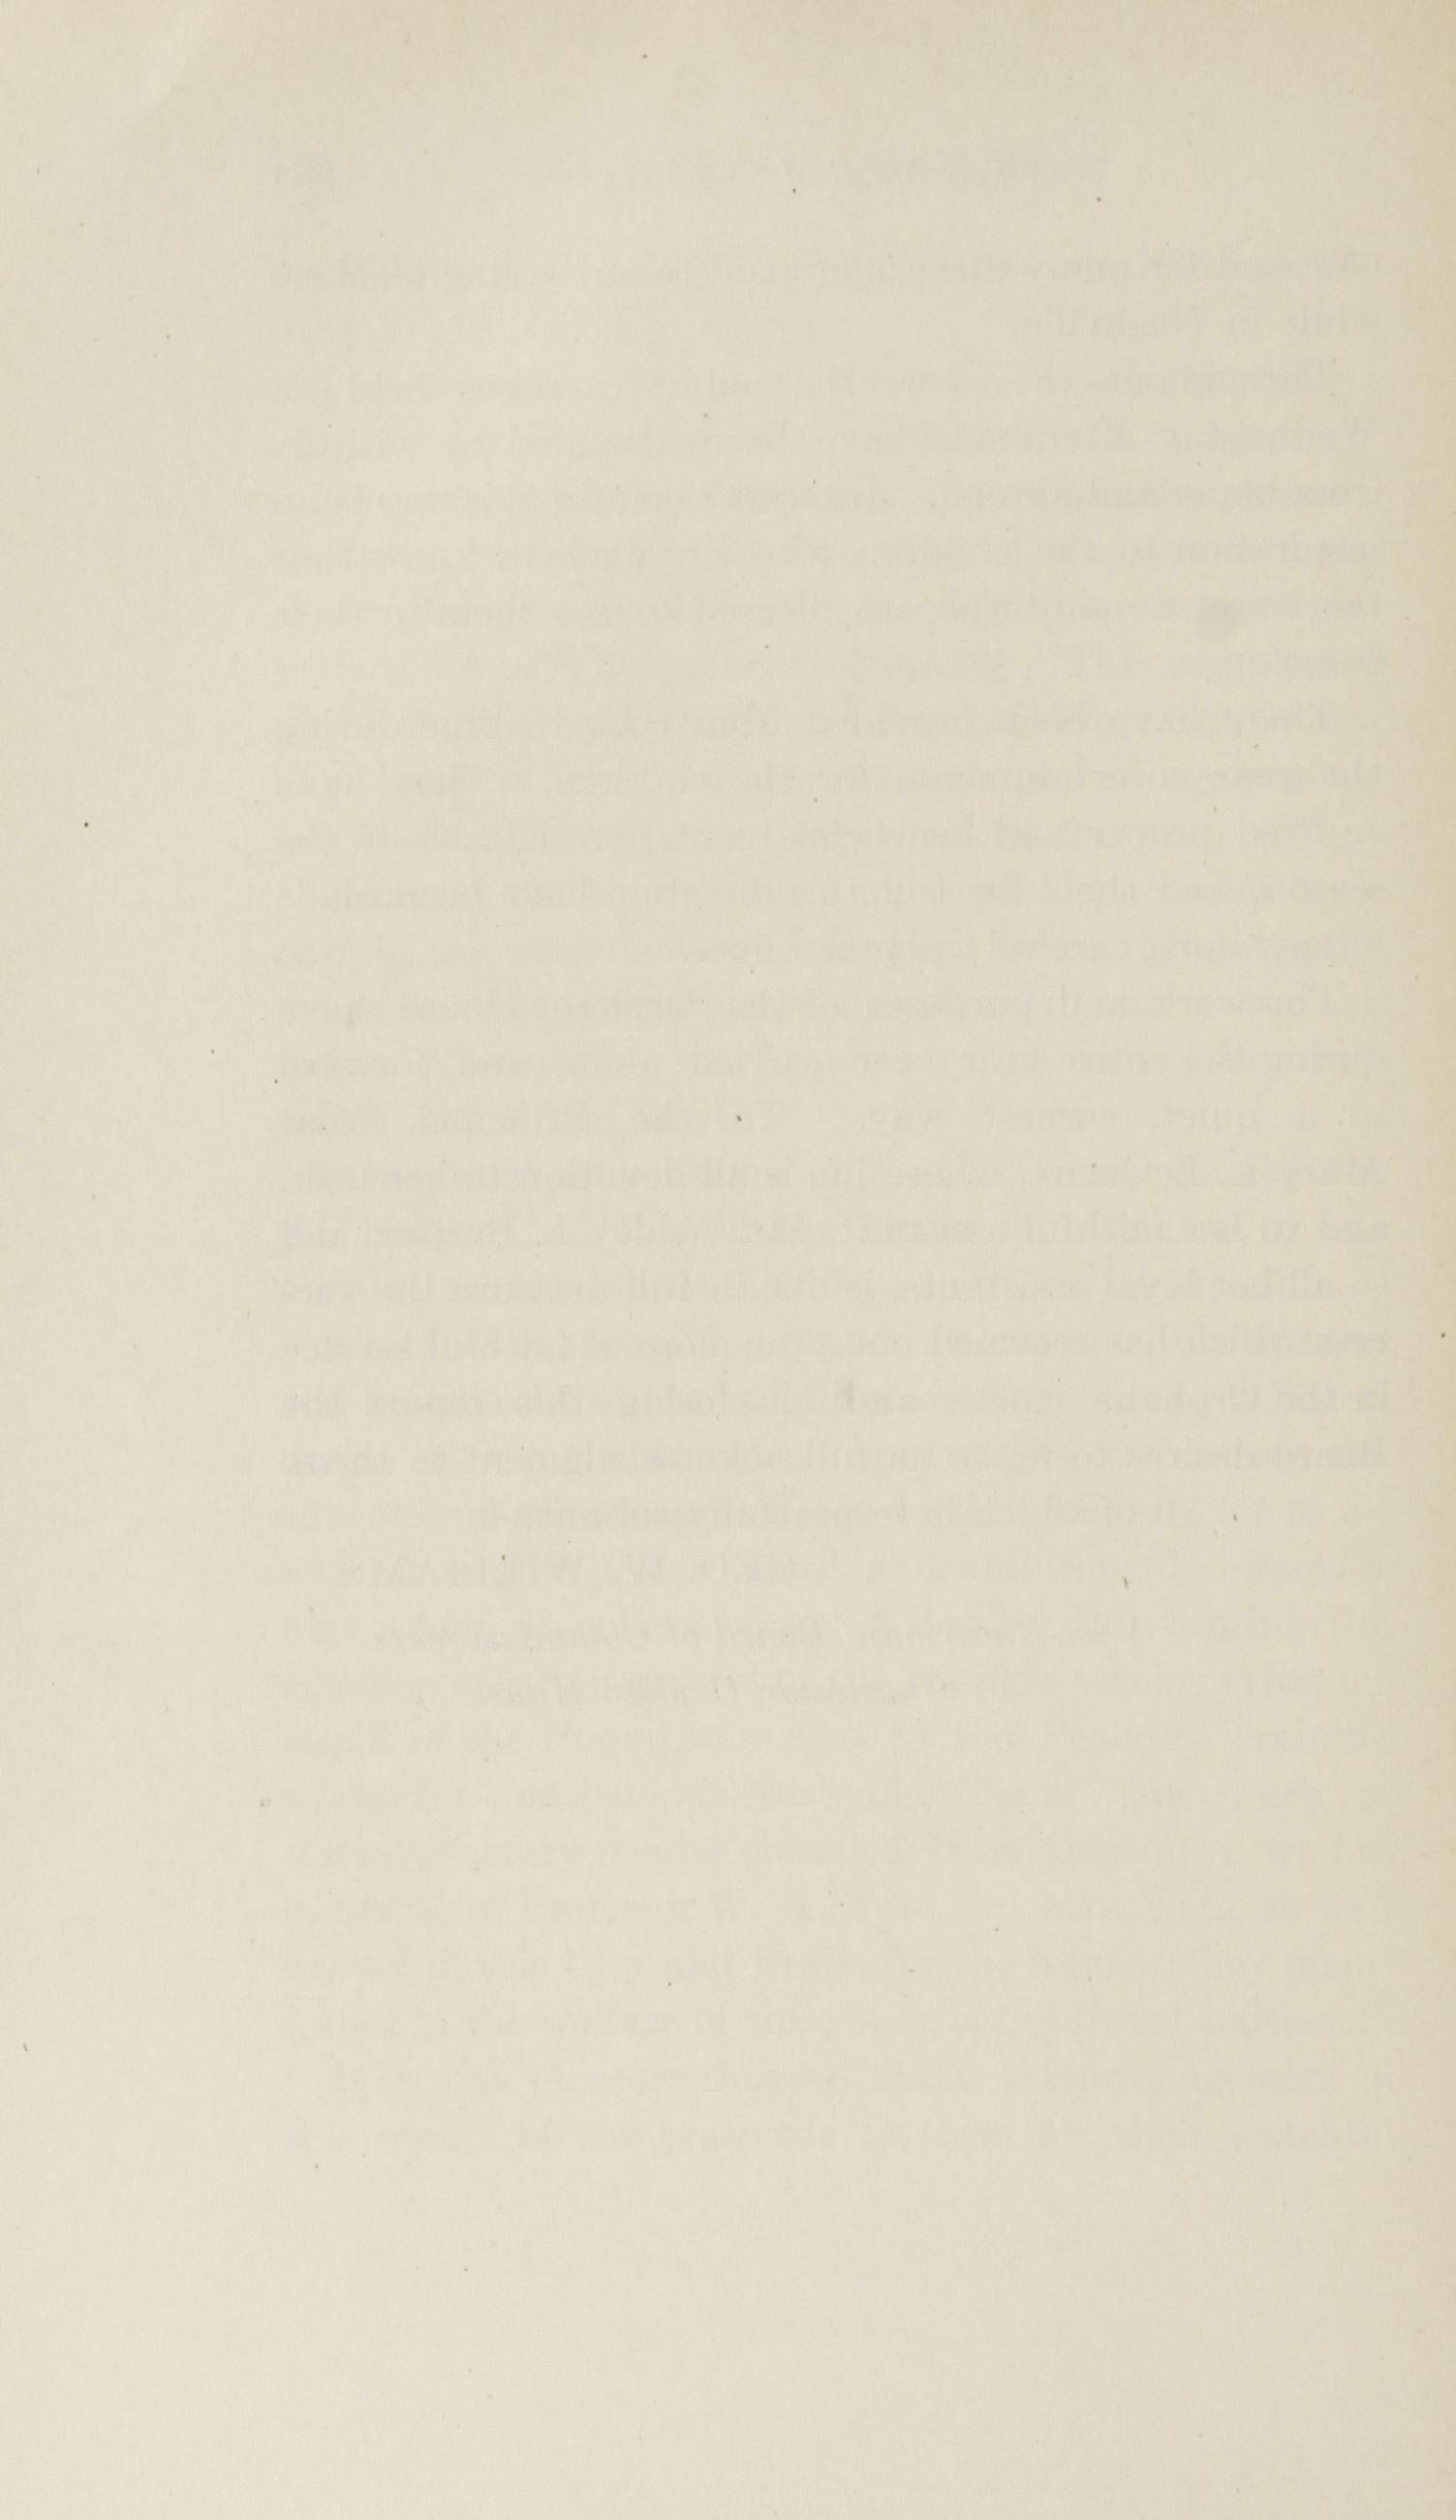 Charleston Yearbook, 1915, page 382